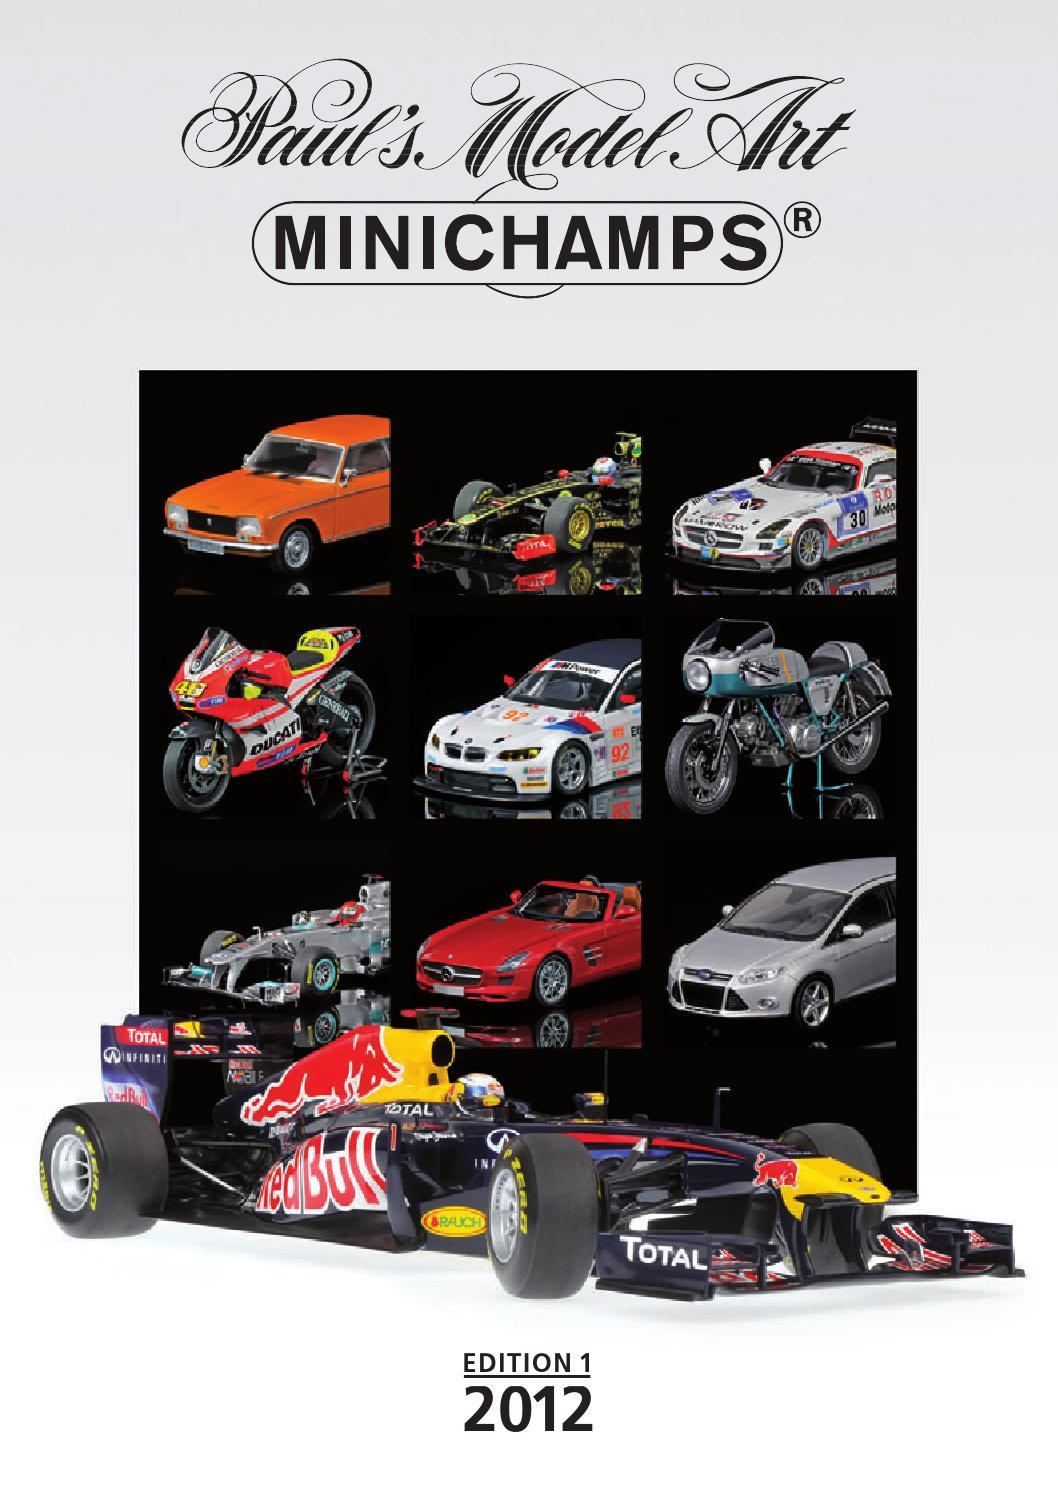 Minichamps Catalog 2012 by Minichamps - issuu